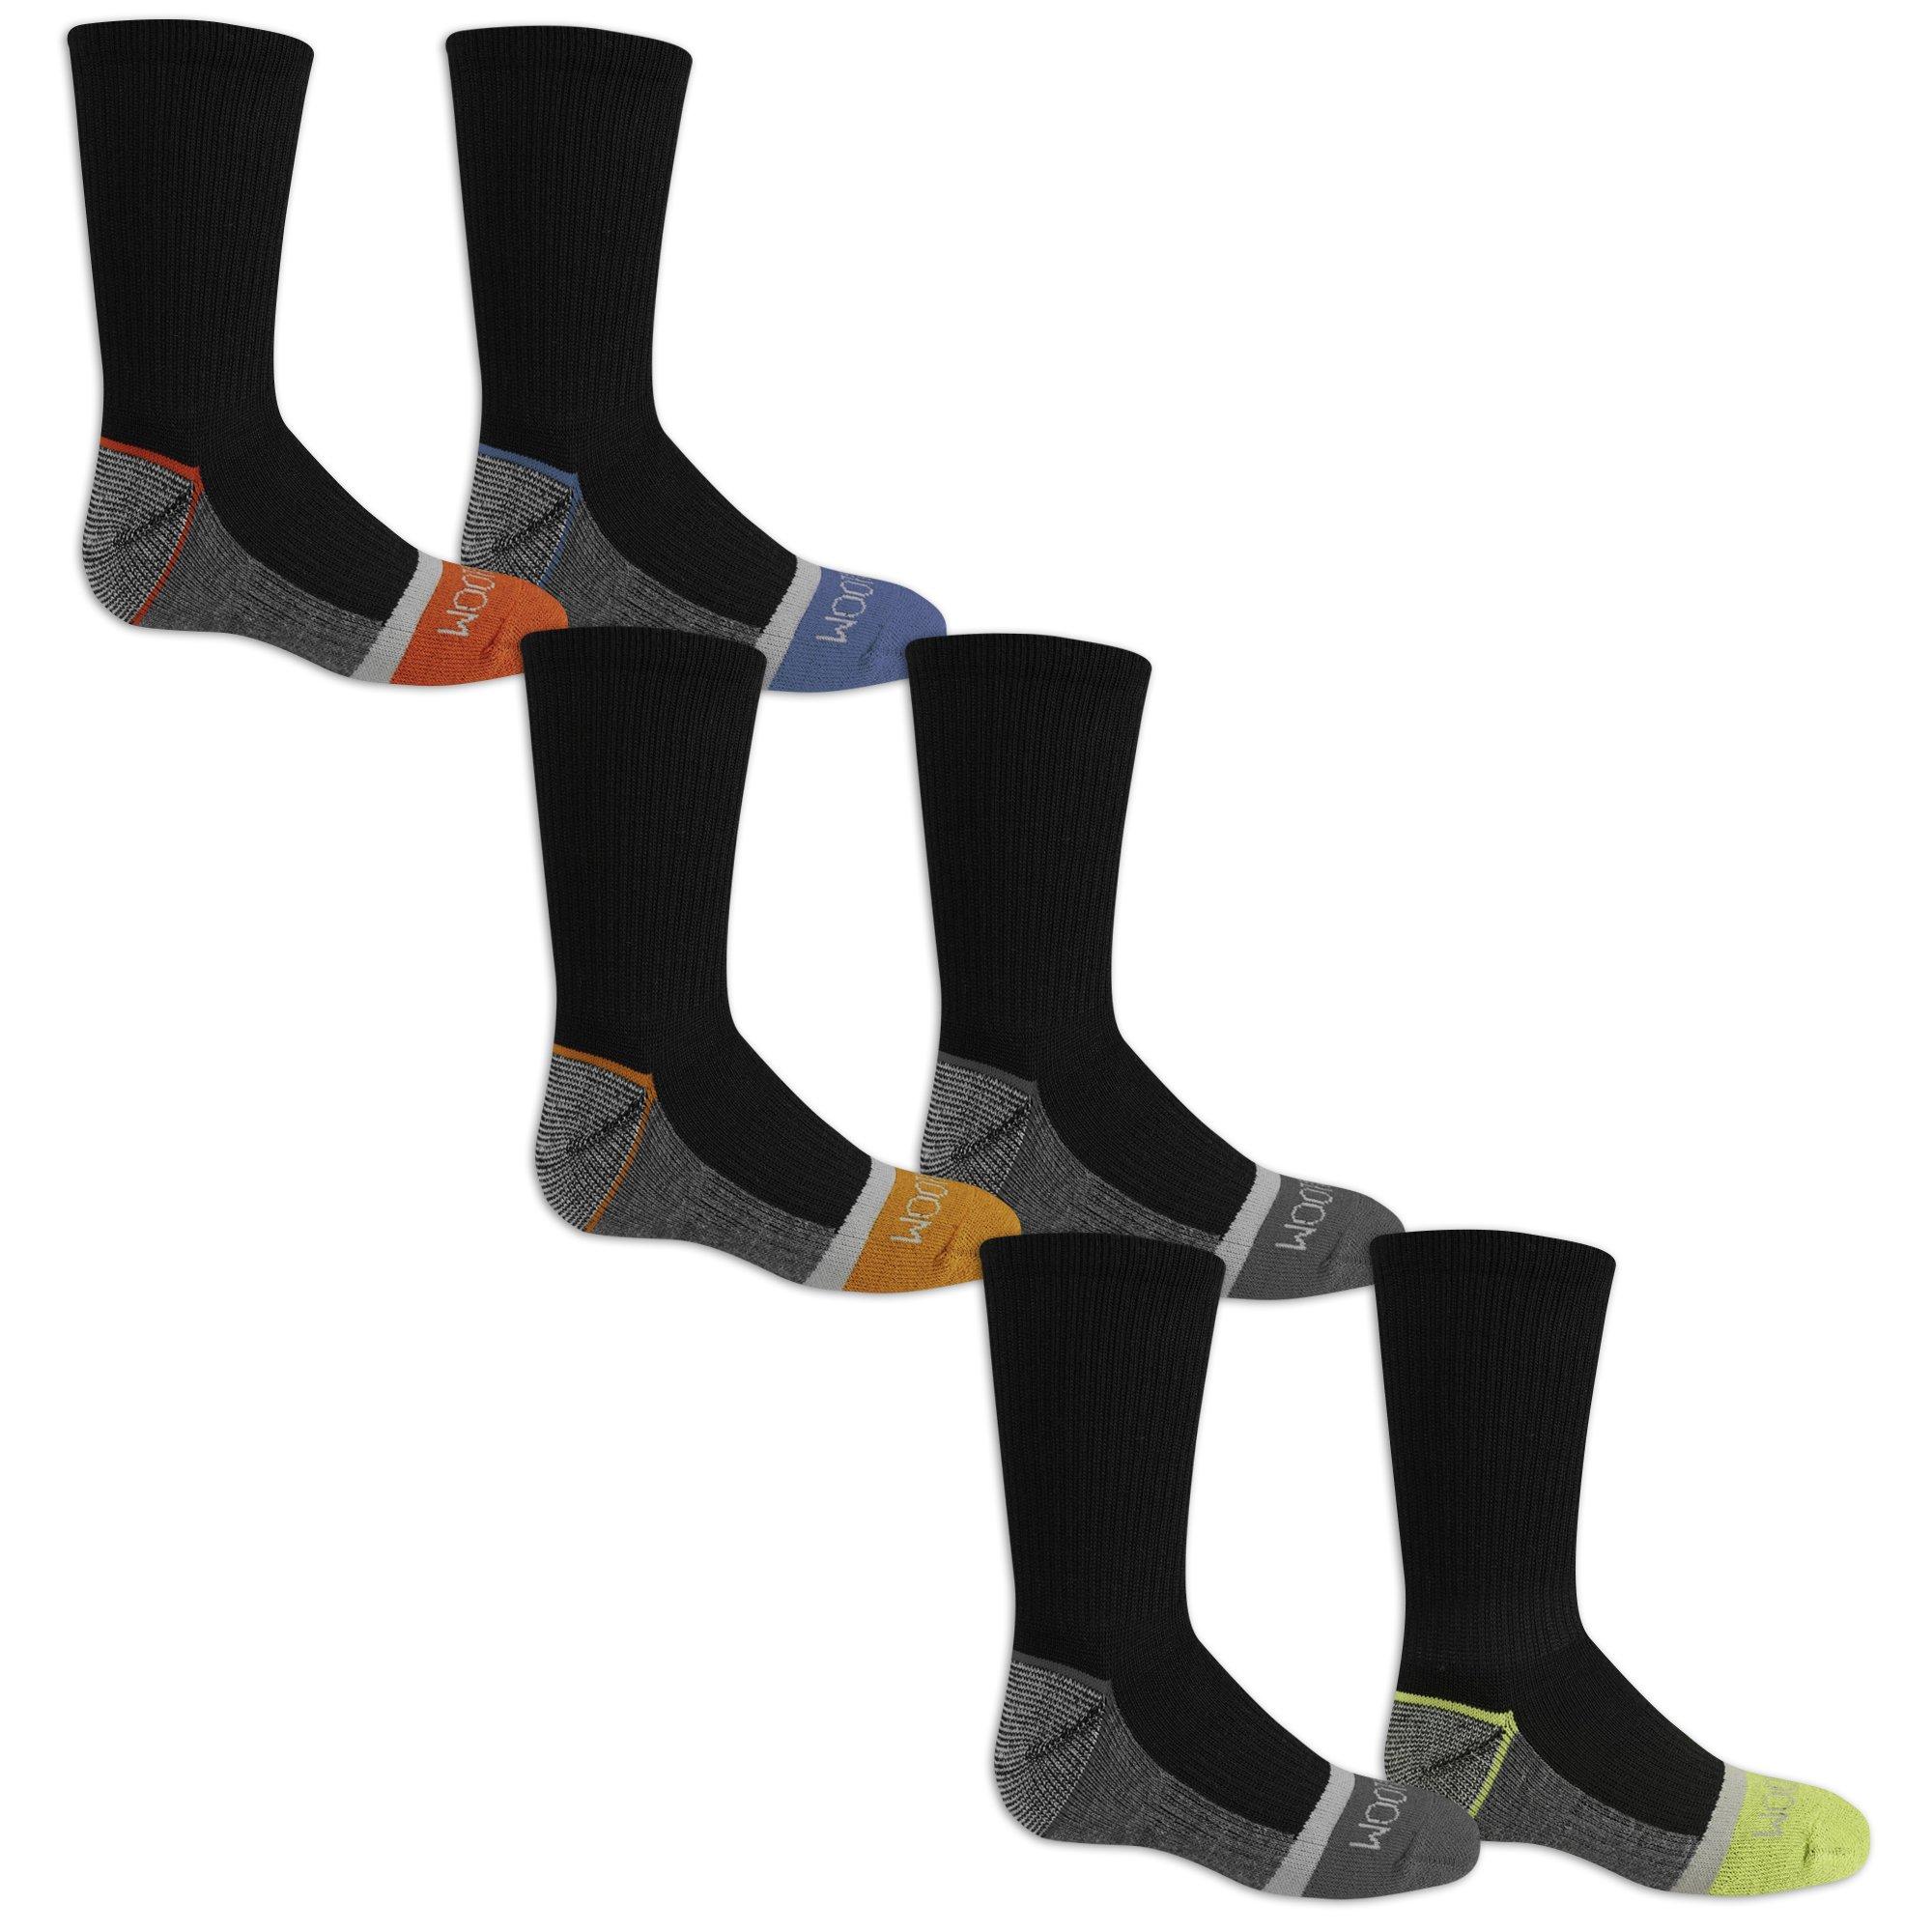 Fruit of the Loom Boys 6-Pair Half Cushion Crew Socks